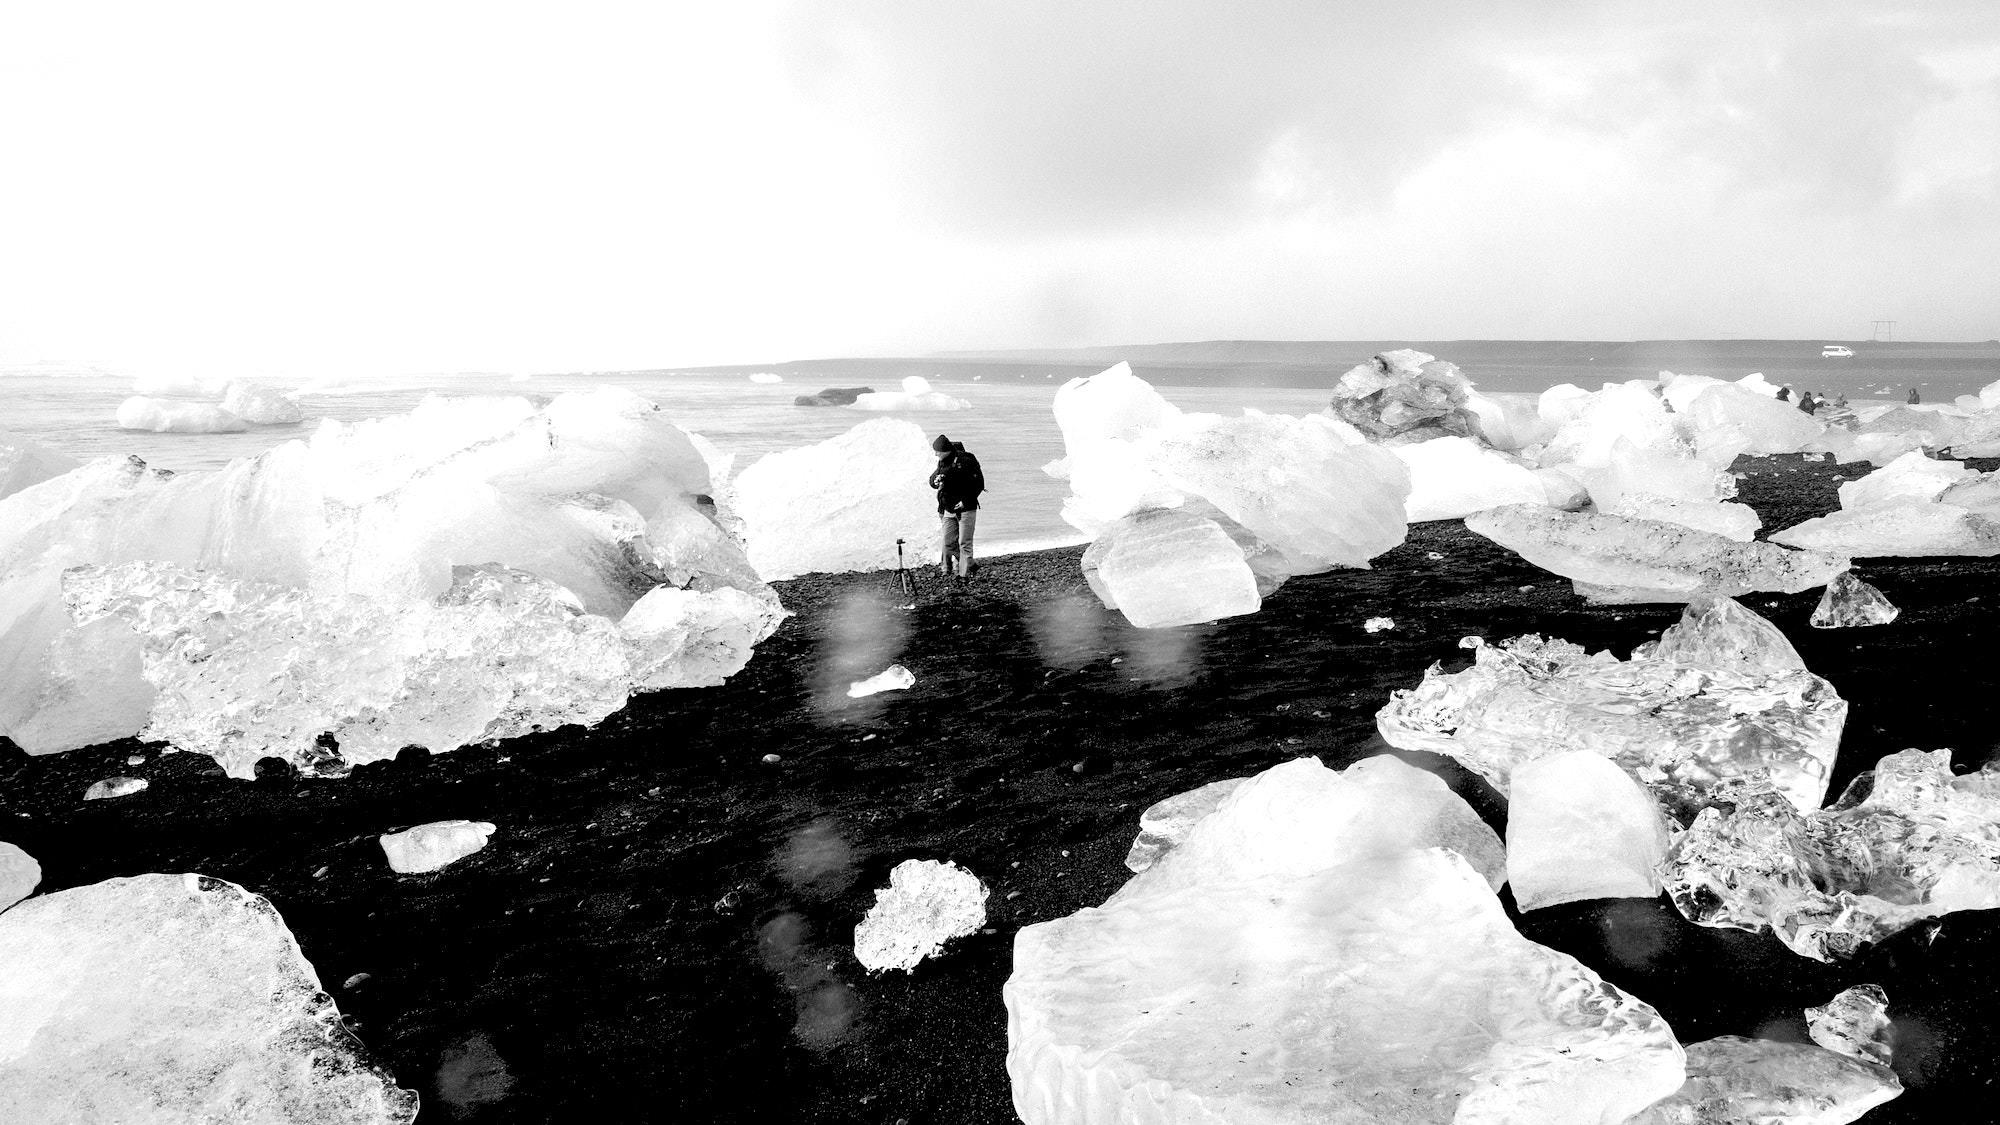 beach-black-sand-climate-change-1670845.jpg